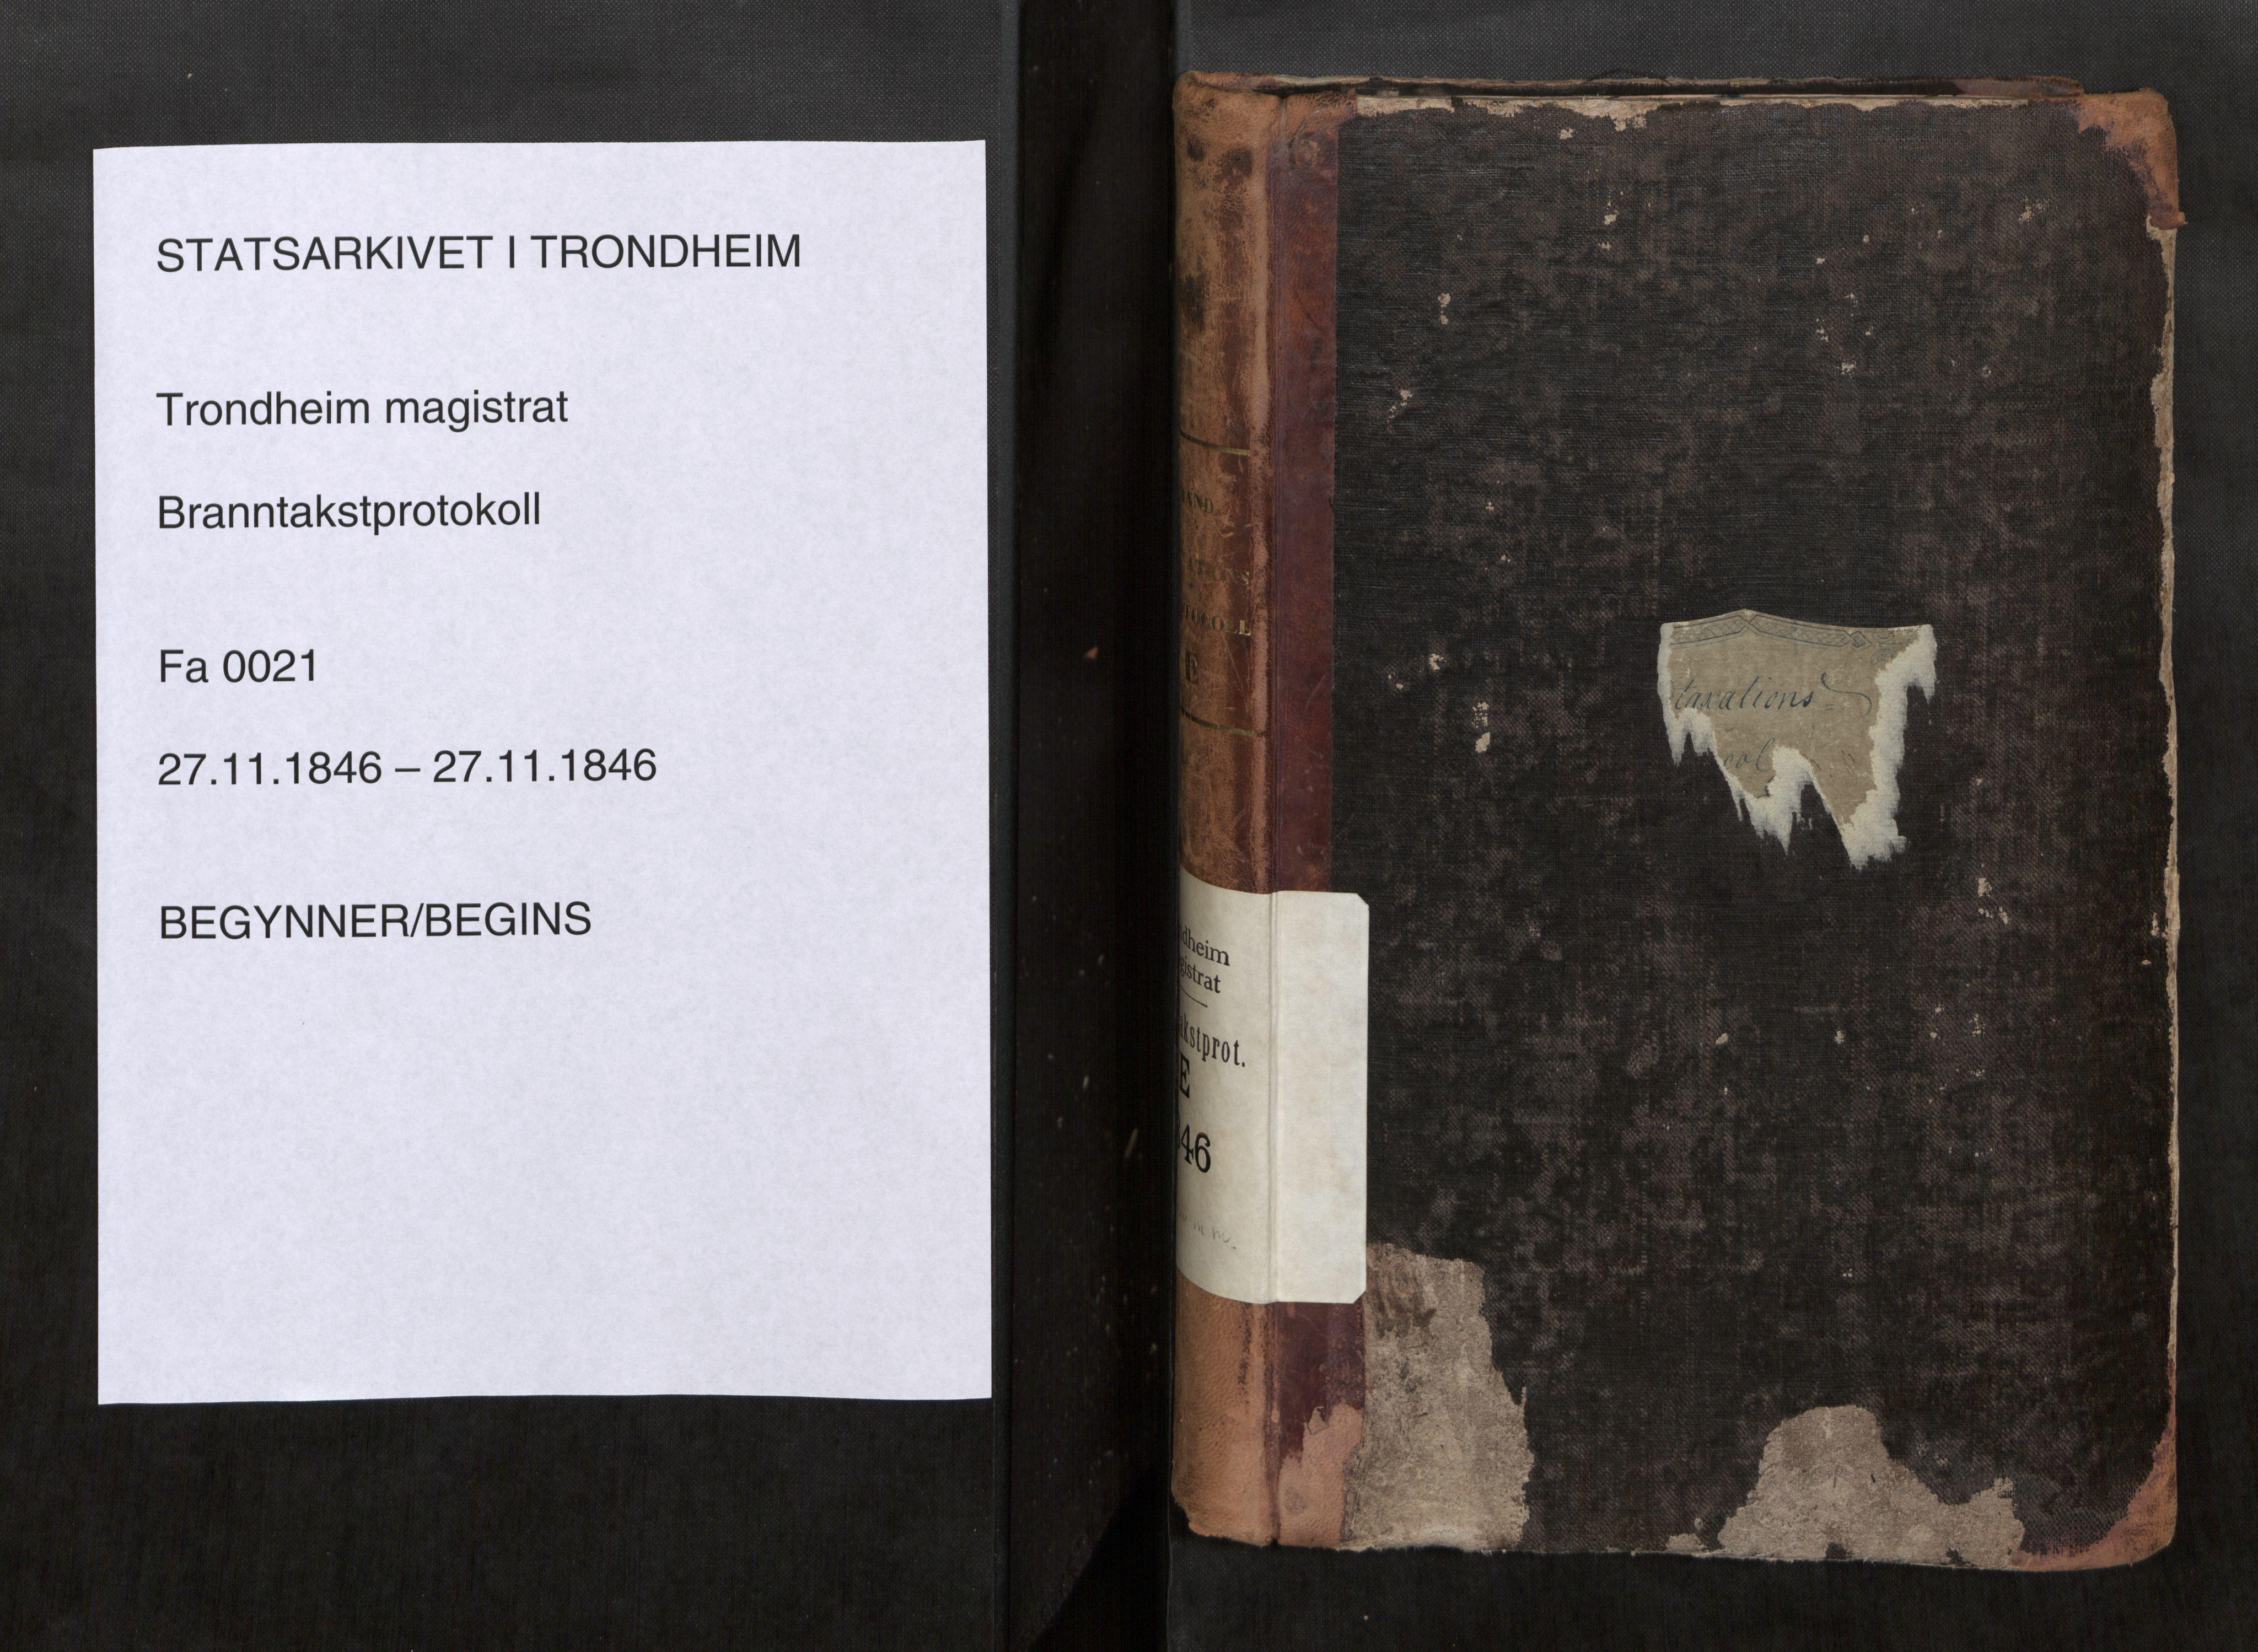 SAT, Norges Brannkasse Trondheim magistrat, Branntakstprotokoller med tekst, nr. 21: 1846, 1846